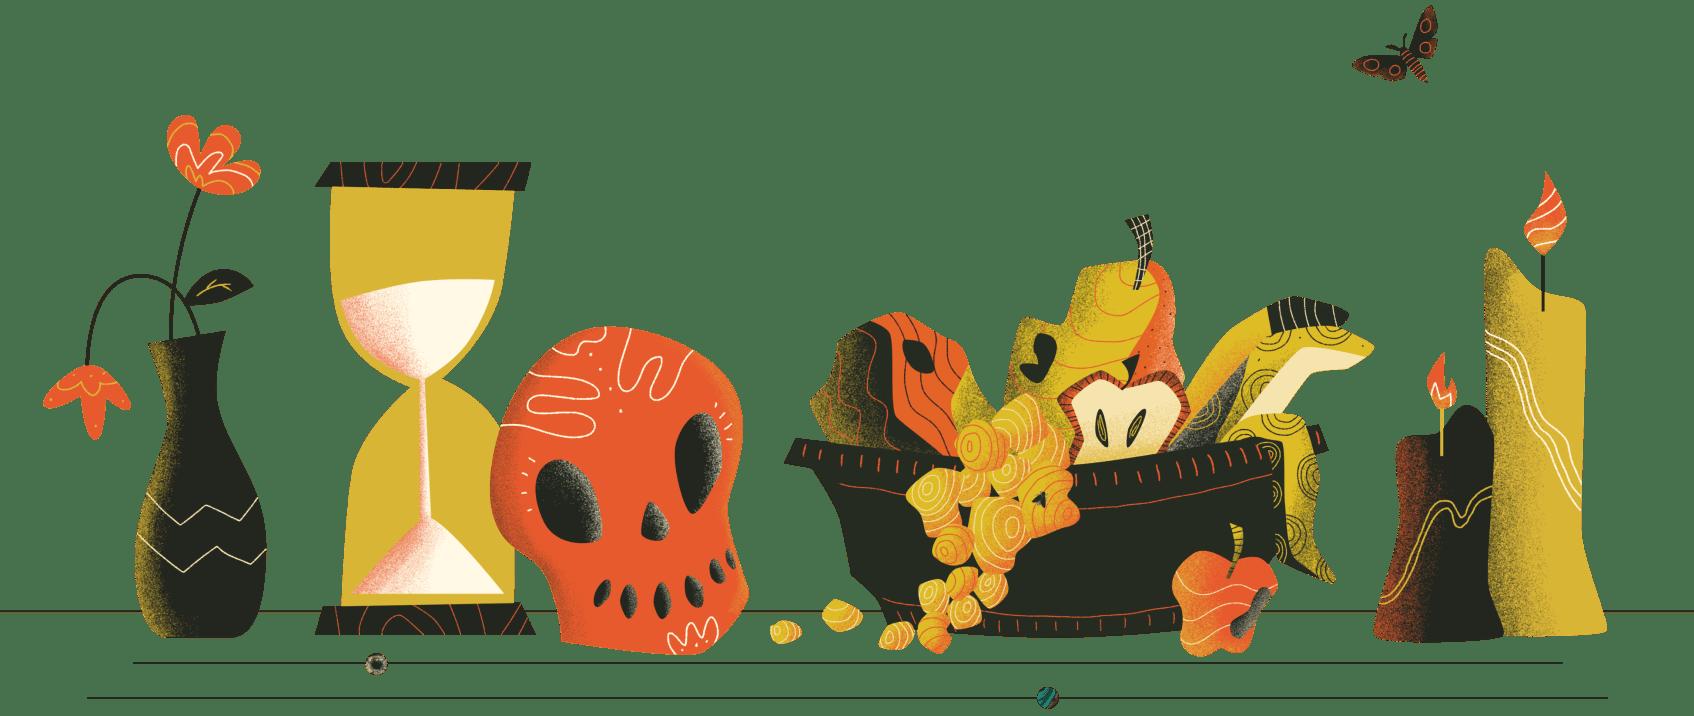 Illustration of vase, hourglass, skull, rotting fruit, moth and burning candles